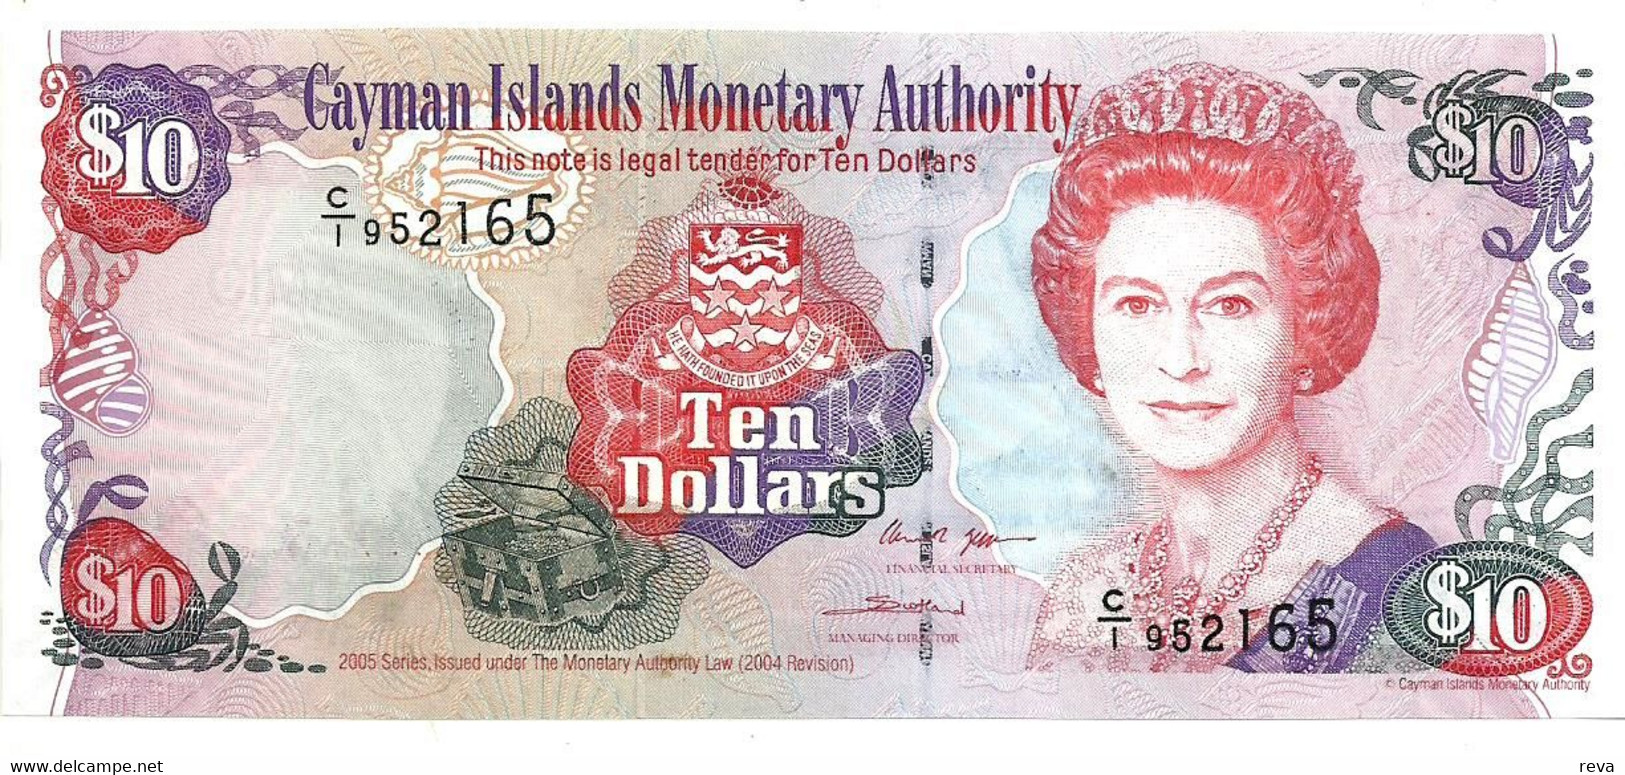 CAYMAN ISLANDS 1 DOLLAR PICK 38b UNC SERIES 2010